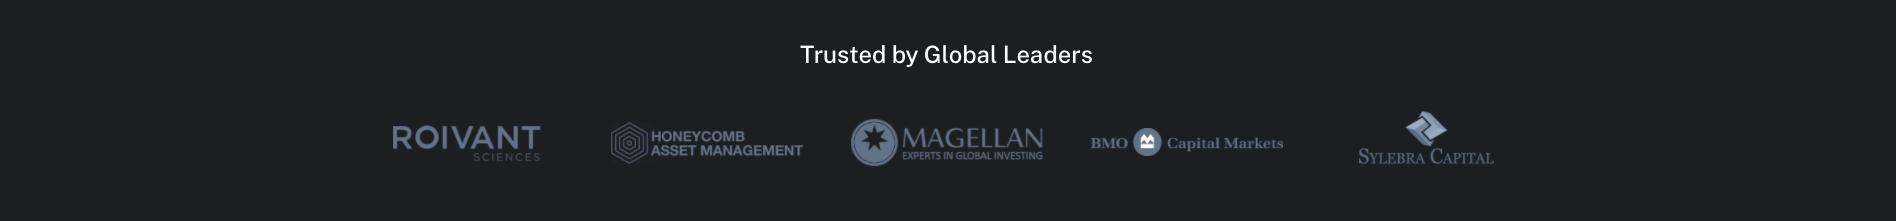 Customer logos 0420 trusted by global leaders